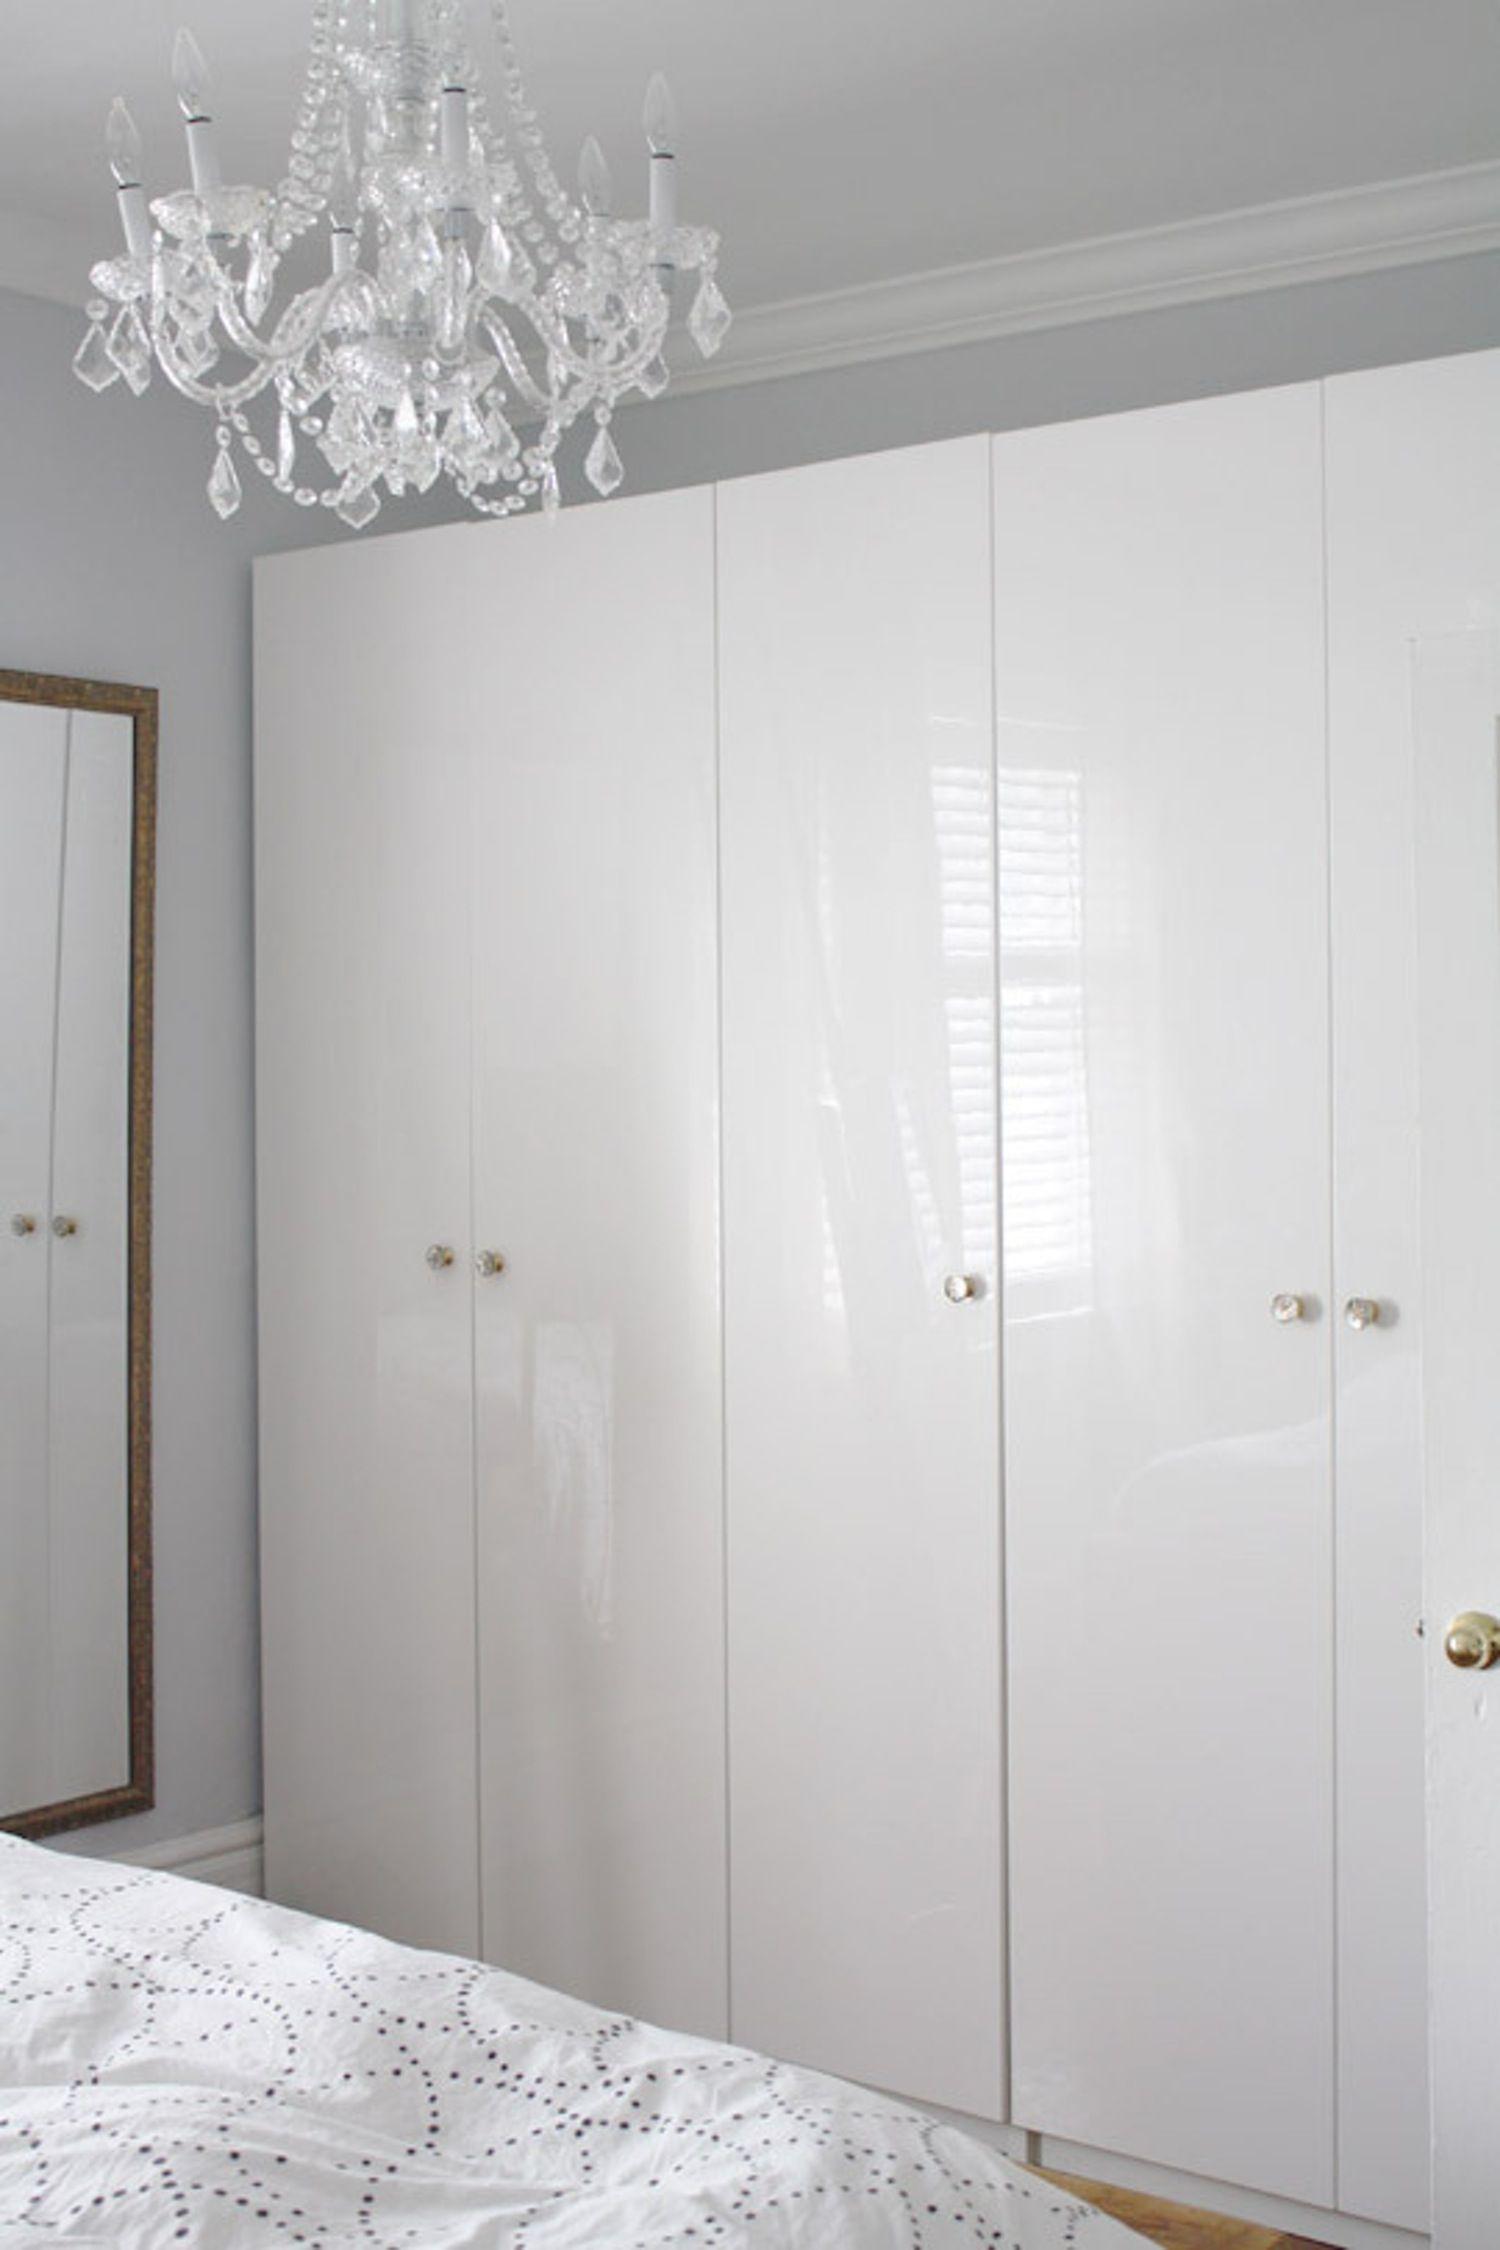 Small Bedroom Ideas 7 Smart Ways To Get More Storage In Your Sleep Space Small Bedroom Bedroom Decor Minimalist Bedroom